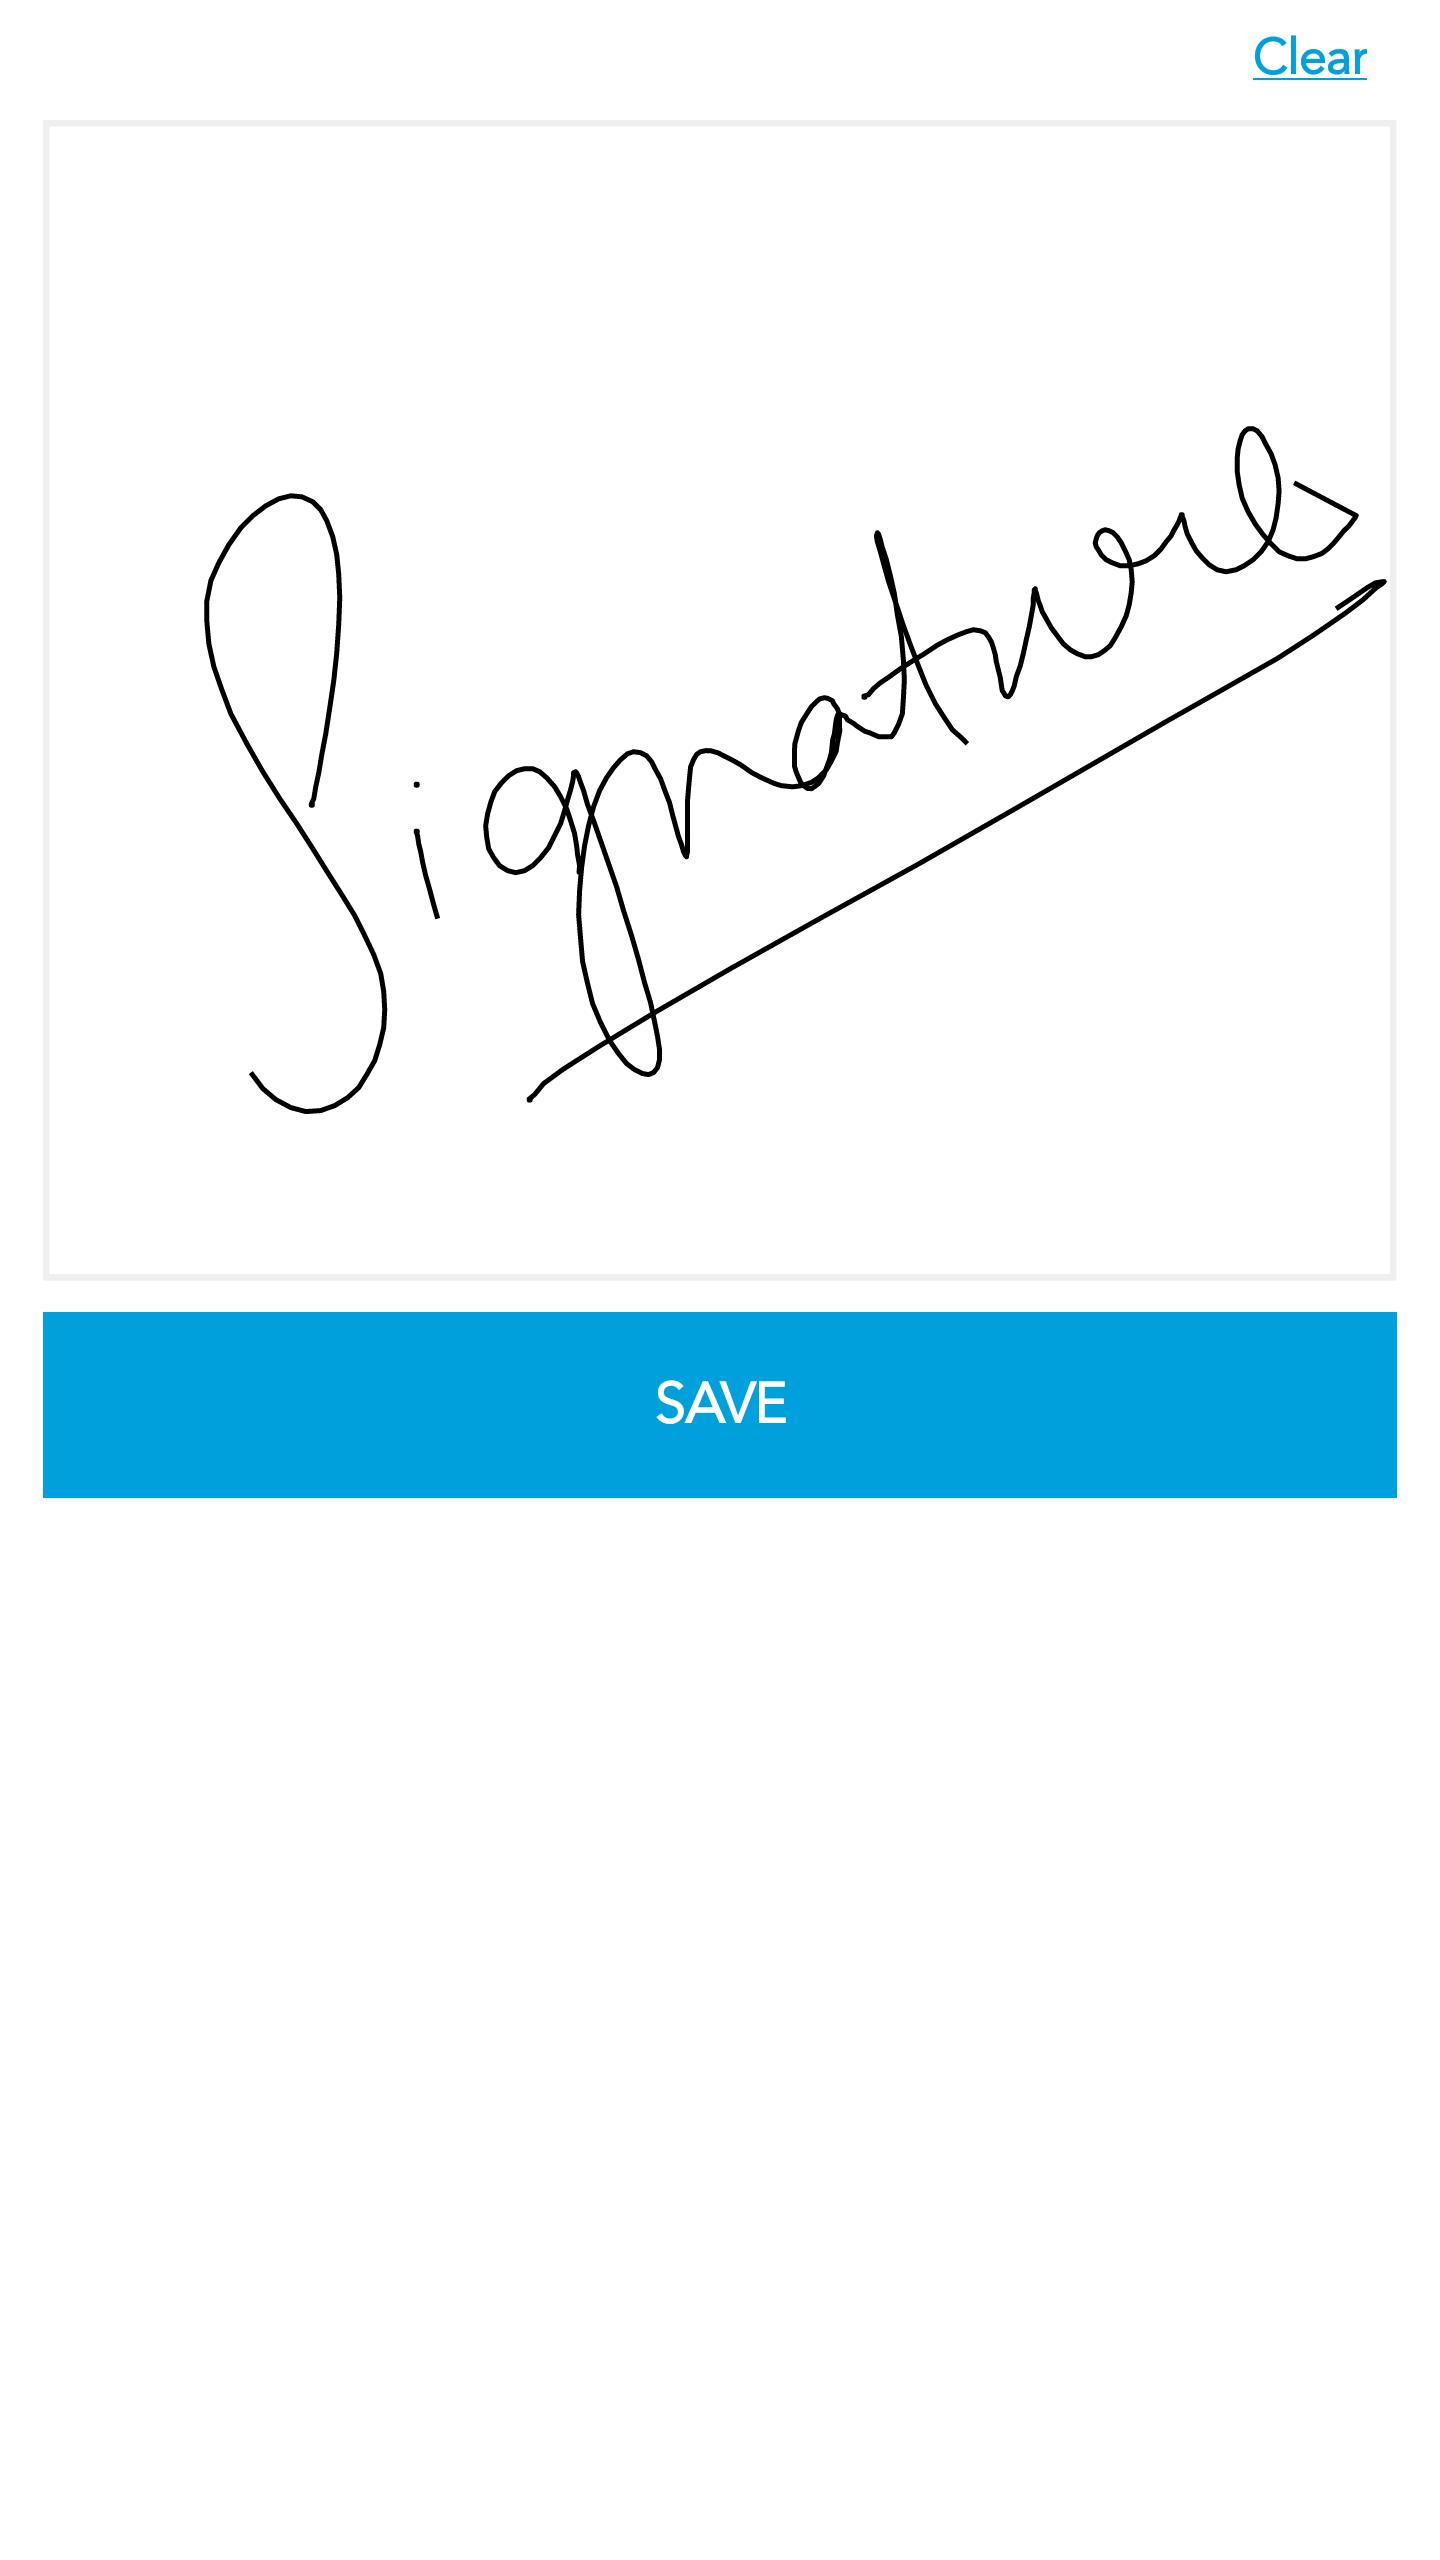 Signature Capture - Screen-Thumbnail